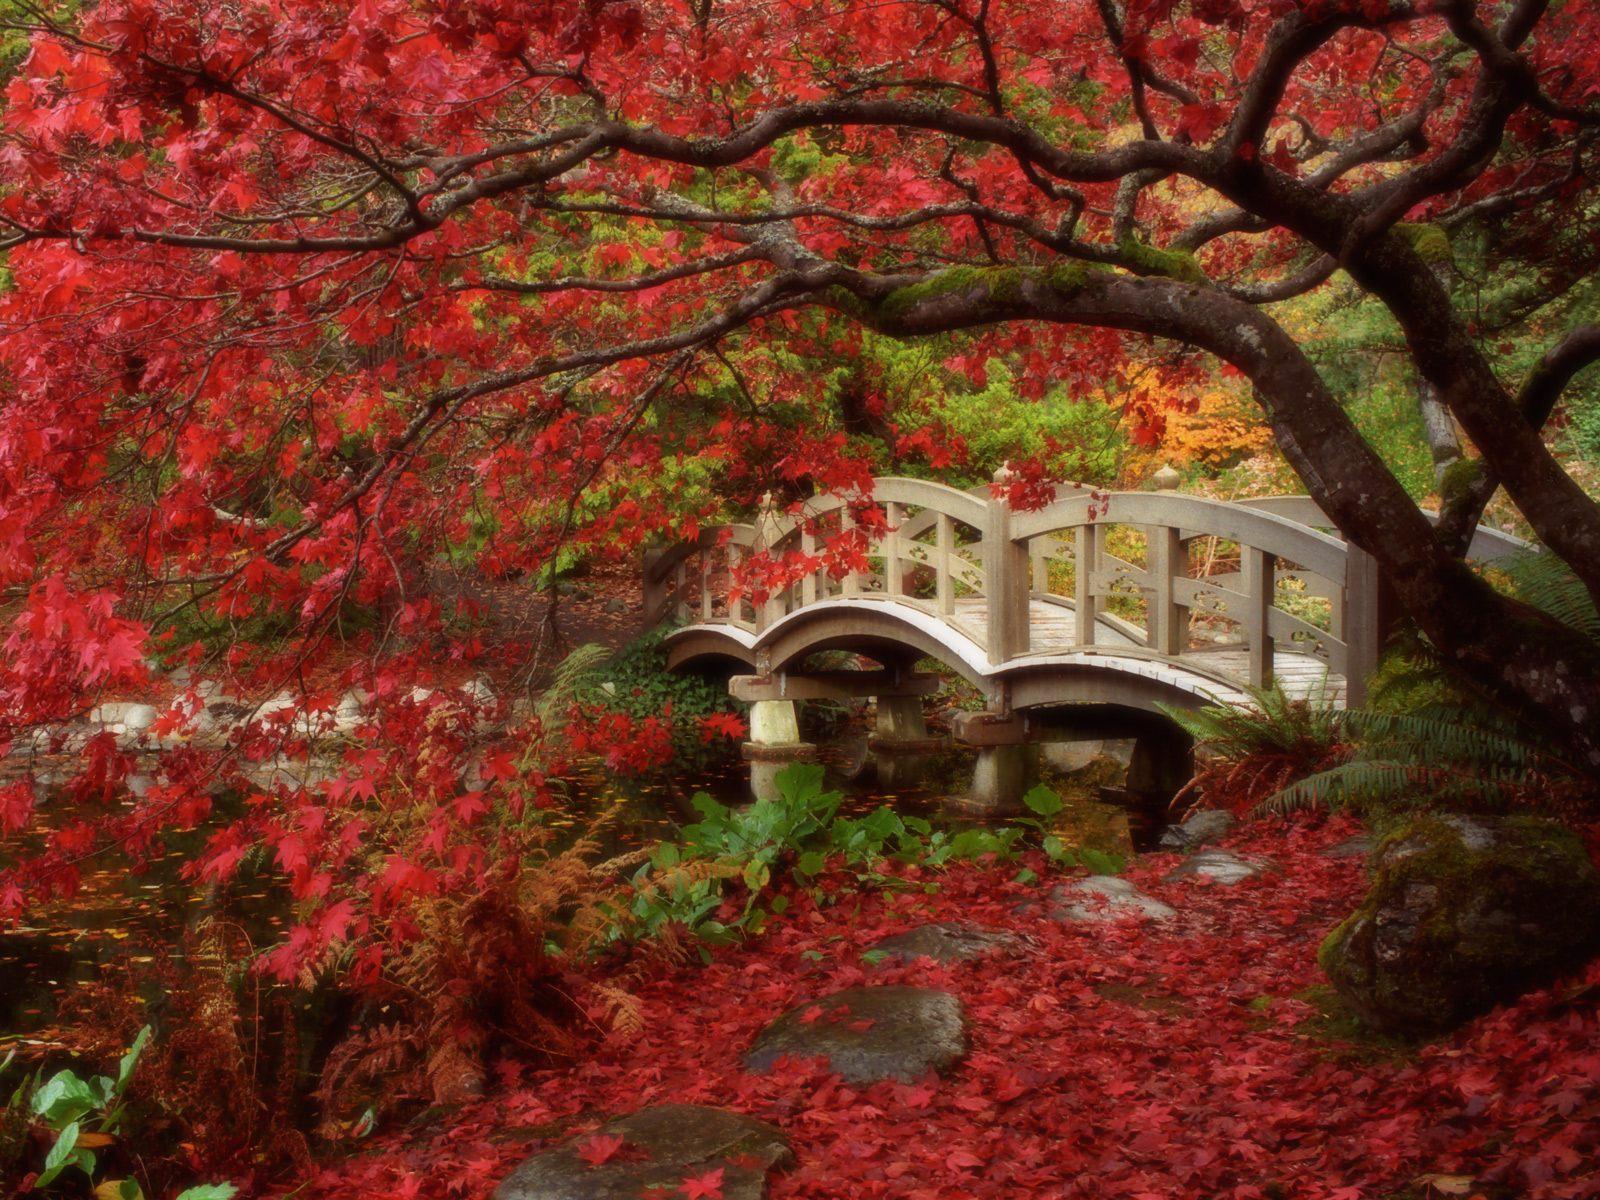 http://4.bp.blogspot.com/_4Cwx1Lb9iWM/TJwrt__OXpI/AAAAAAAAAQY/YBILToijDnE/s1600/JapaneseGardenRoyalRoadsUniversityB.jpg